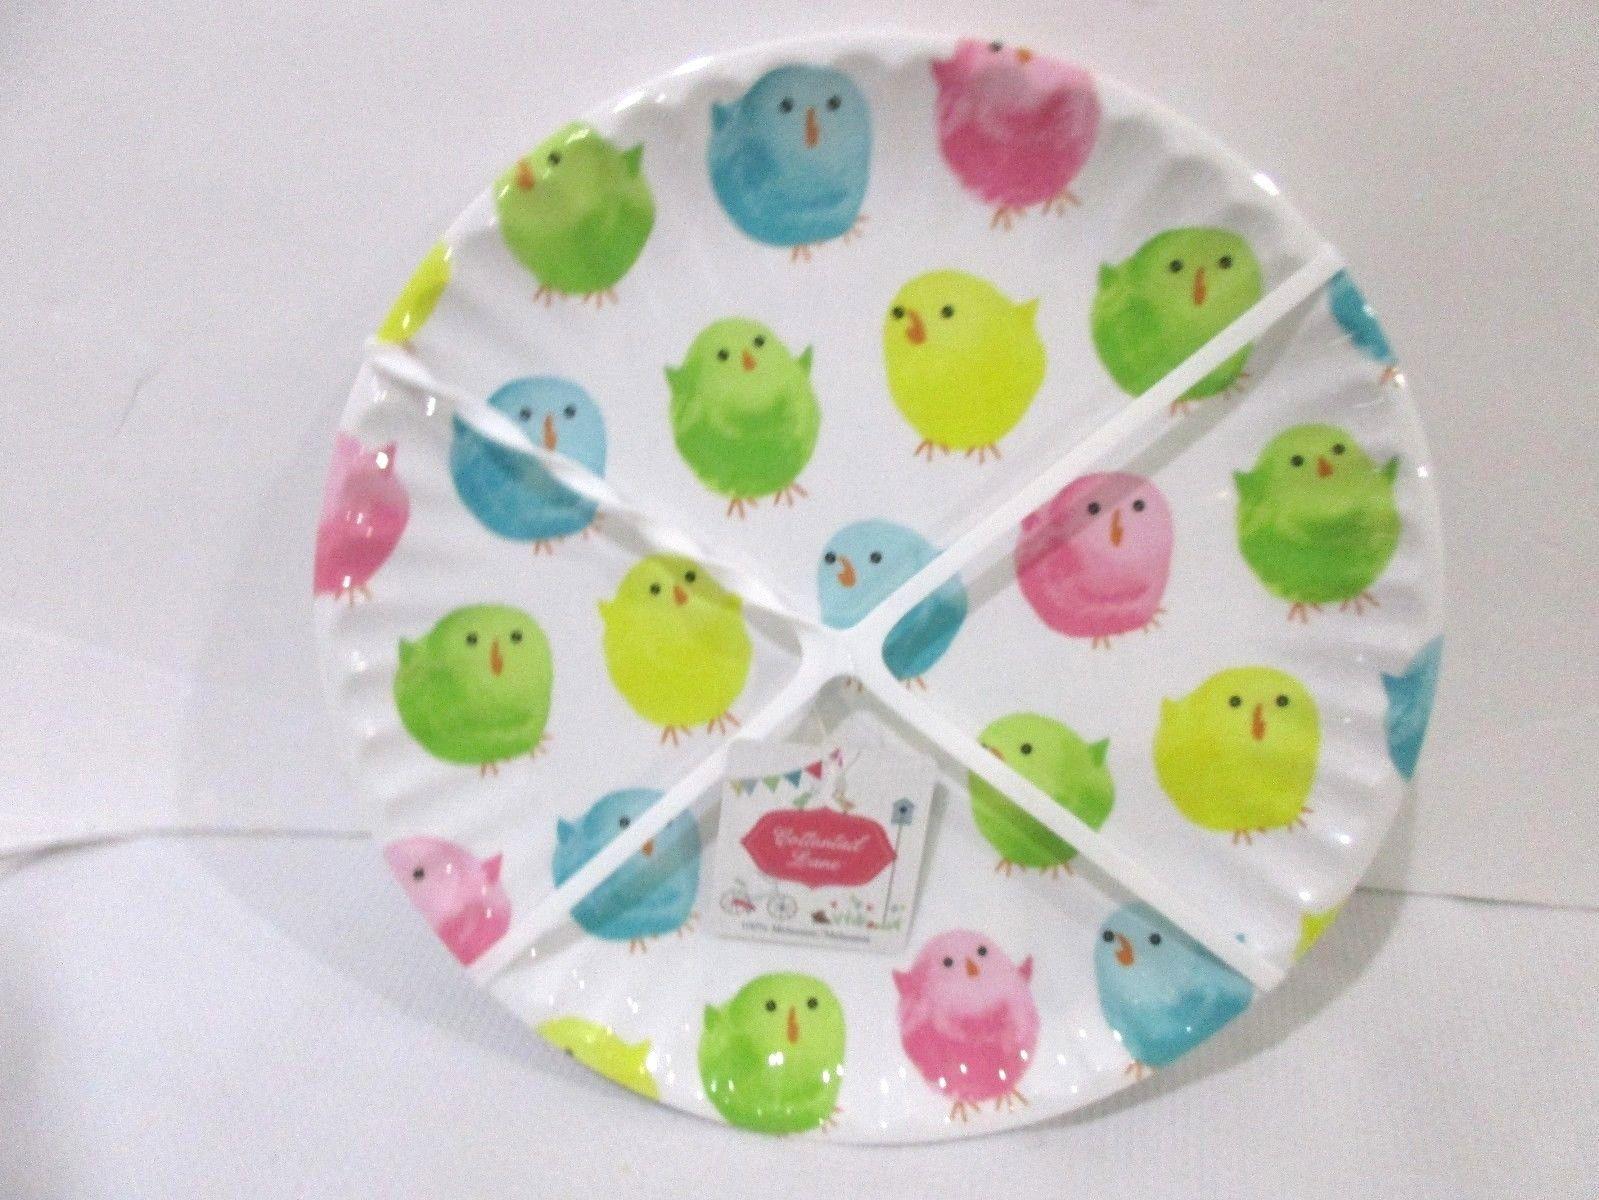 Cottontail Lane Easter Baby Chicks Melamine Dinner Plates Set of 12  sc 1 st  Bonanza & Cottontail Lane Easter Baby Chicks Melamine and 50 similar items